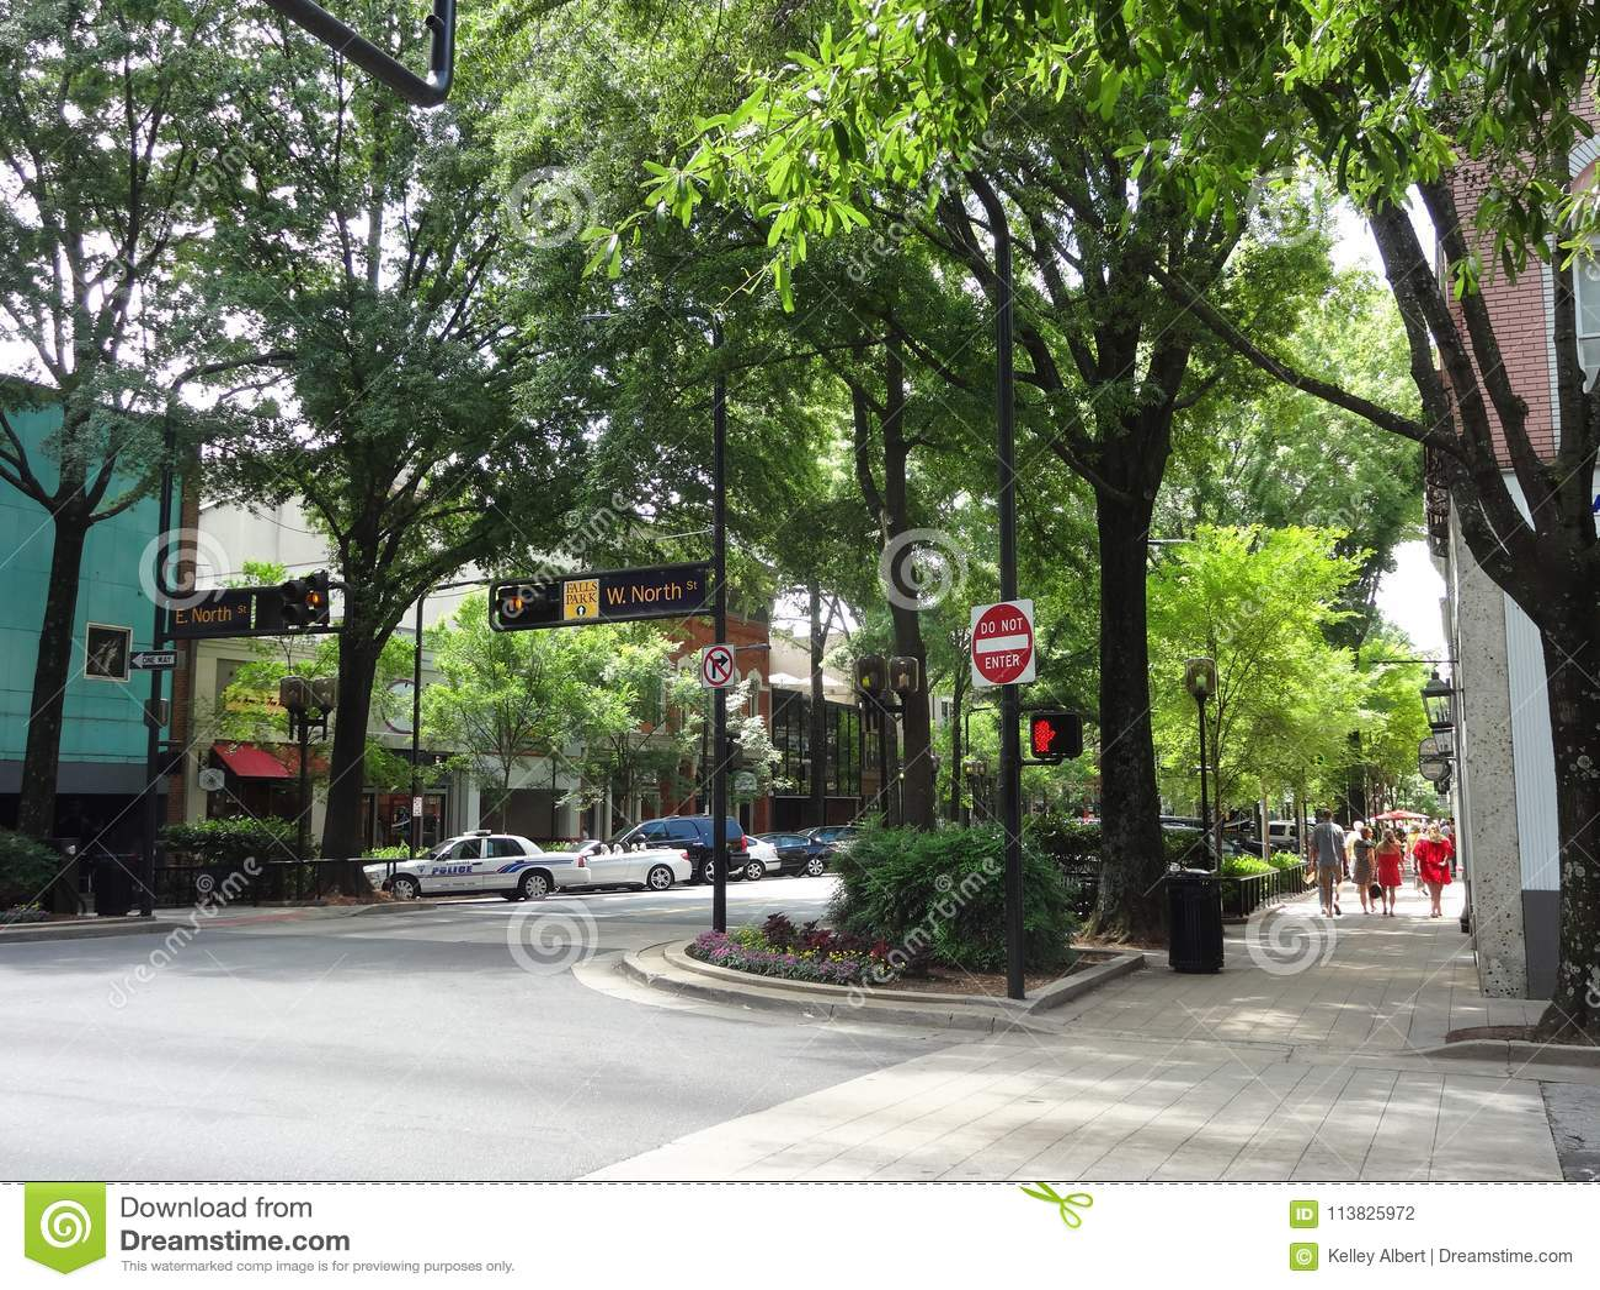 Downtown Greenville, South Carolina